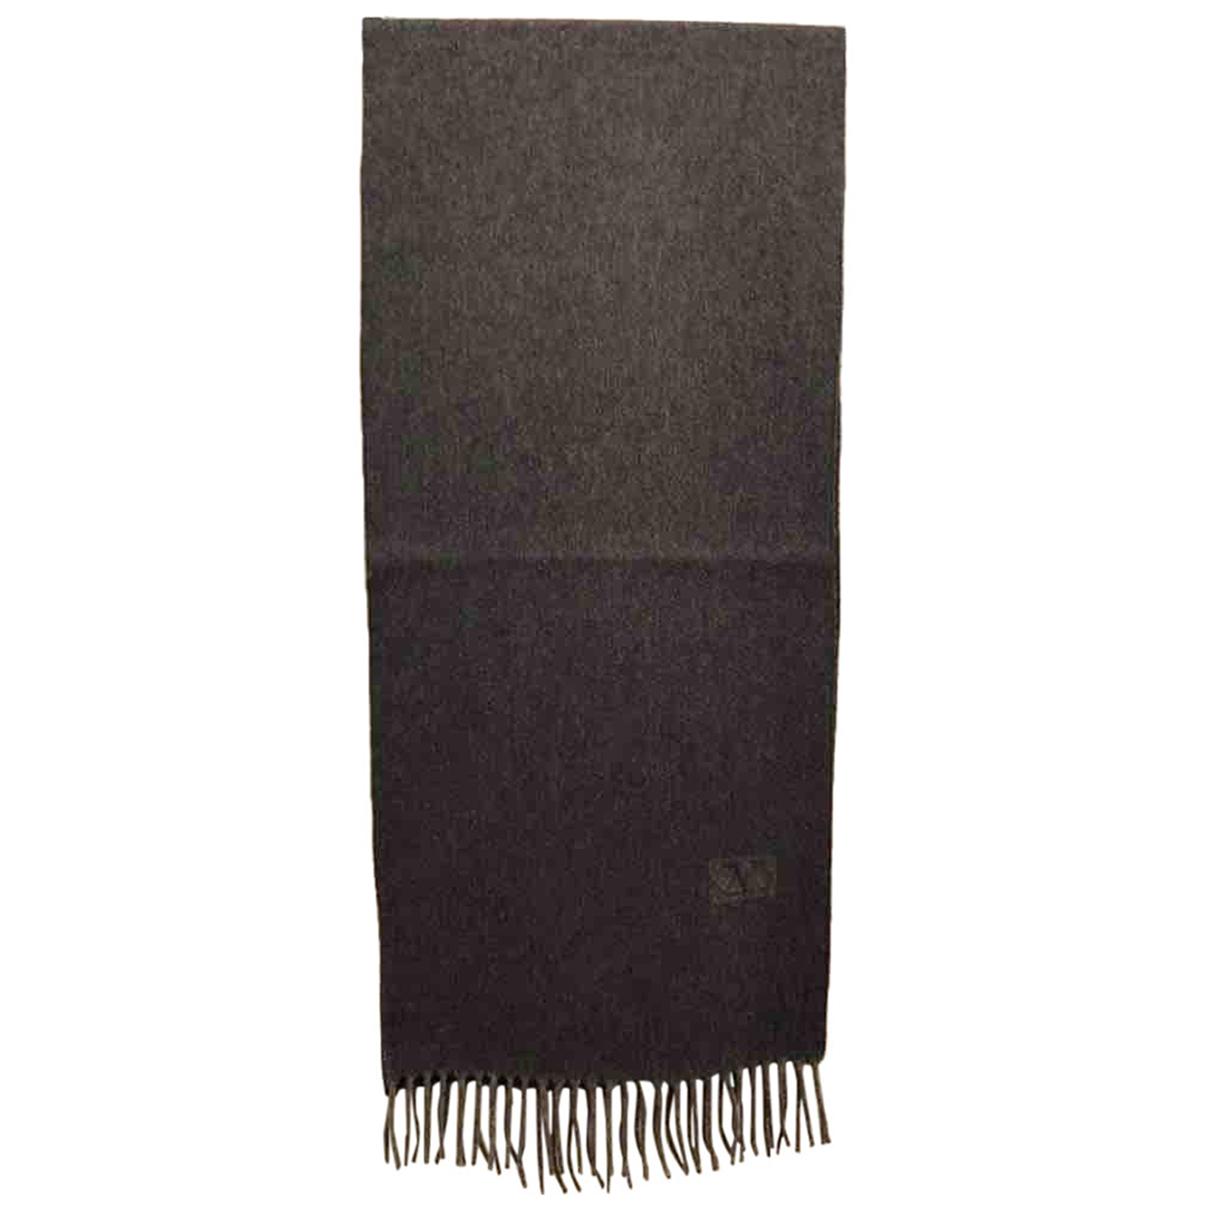 Valentino Garavani N Grey Cashmere scarf & pocket squares for Men N